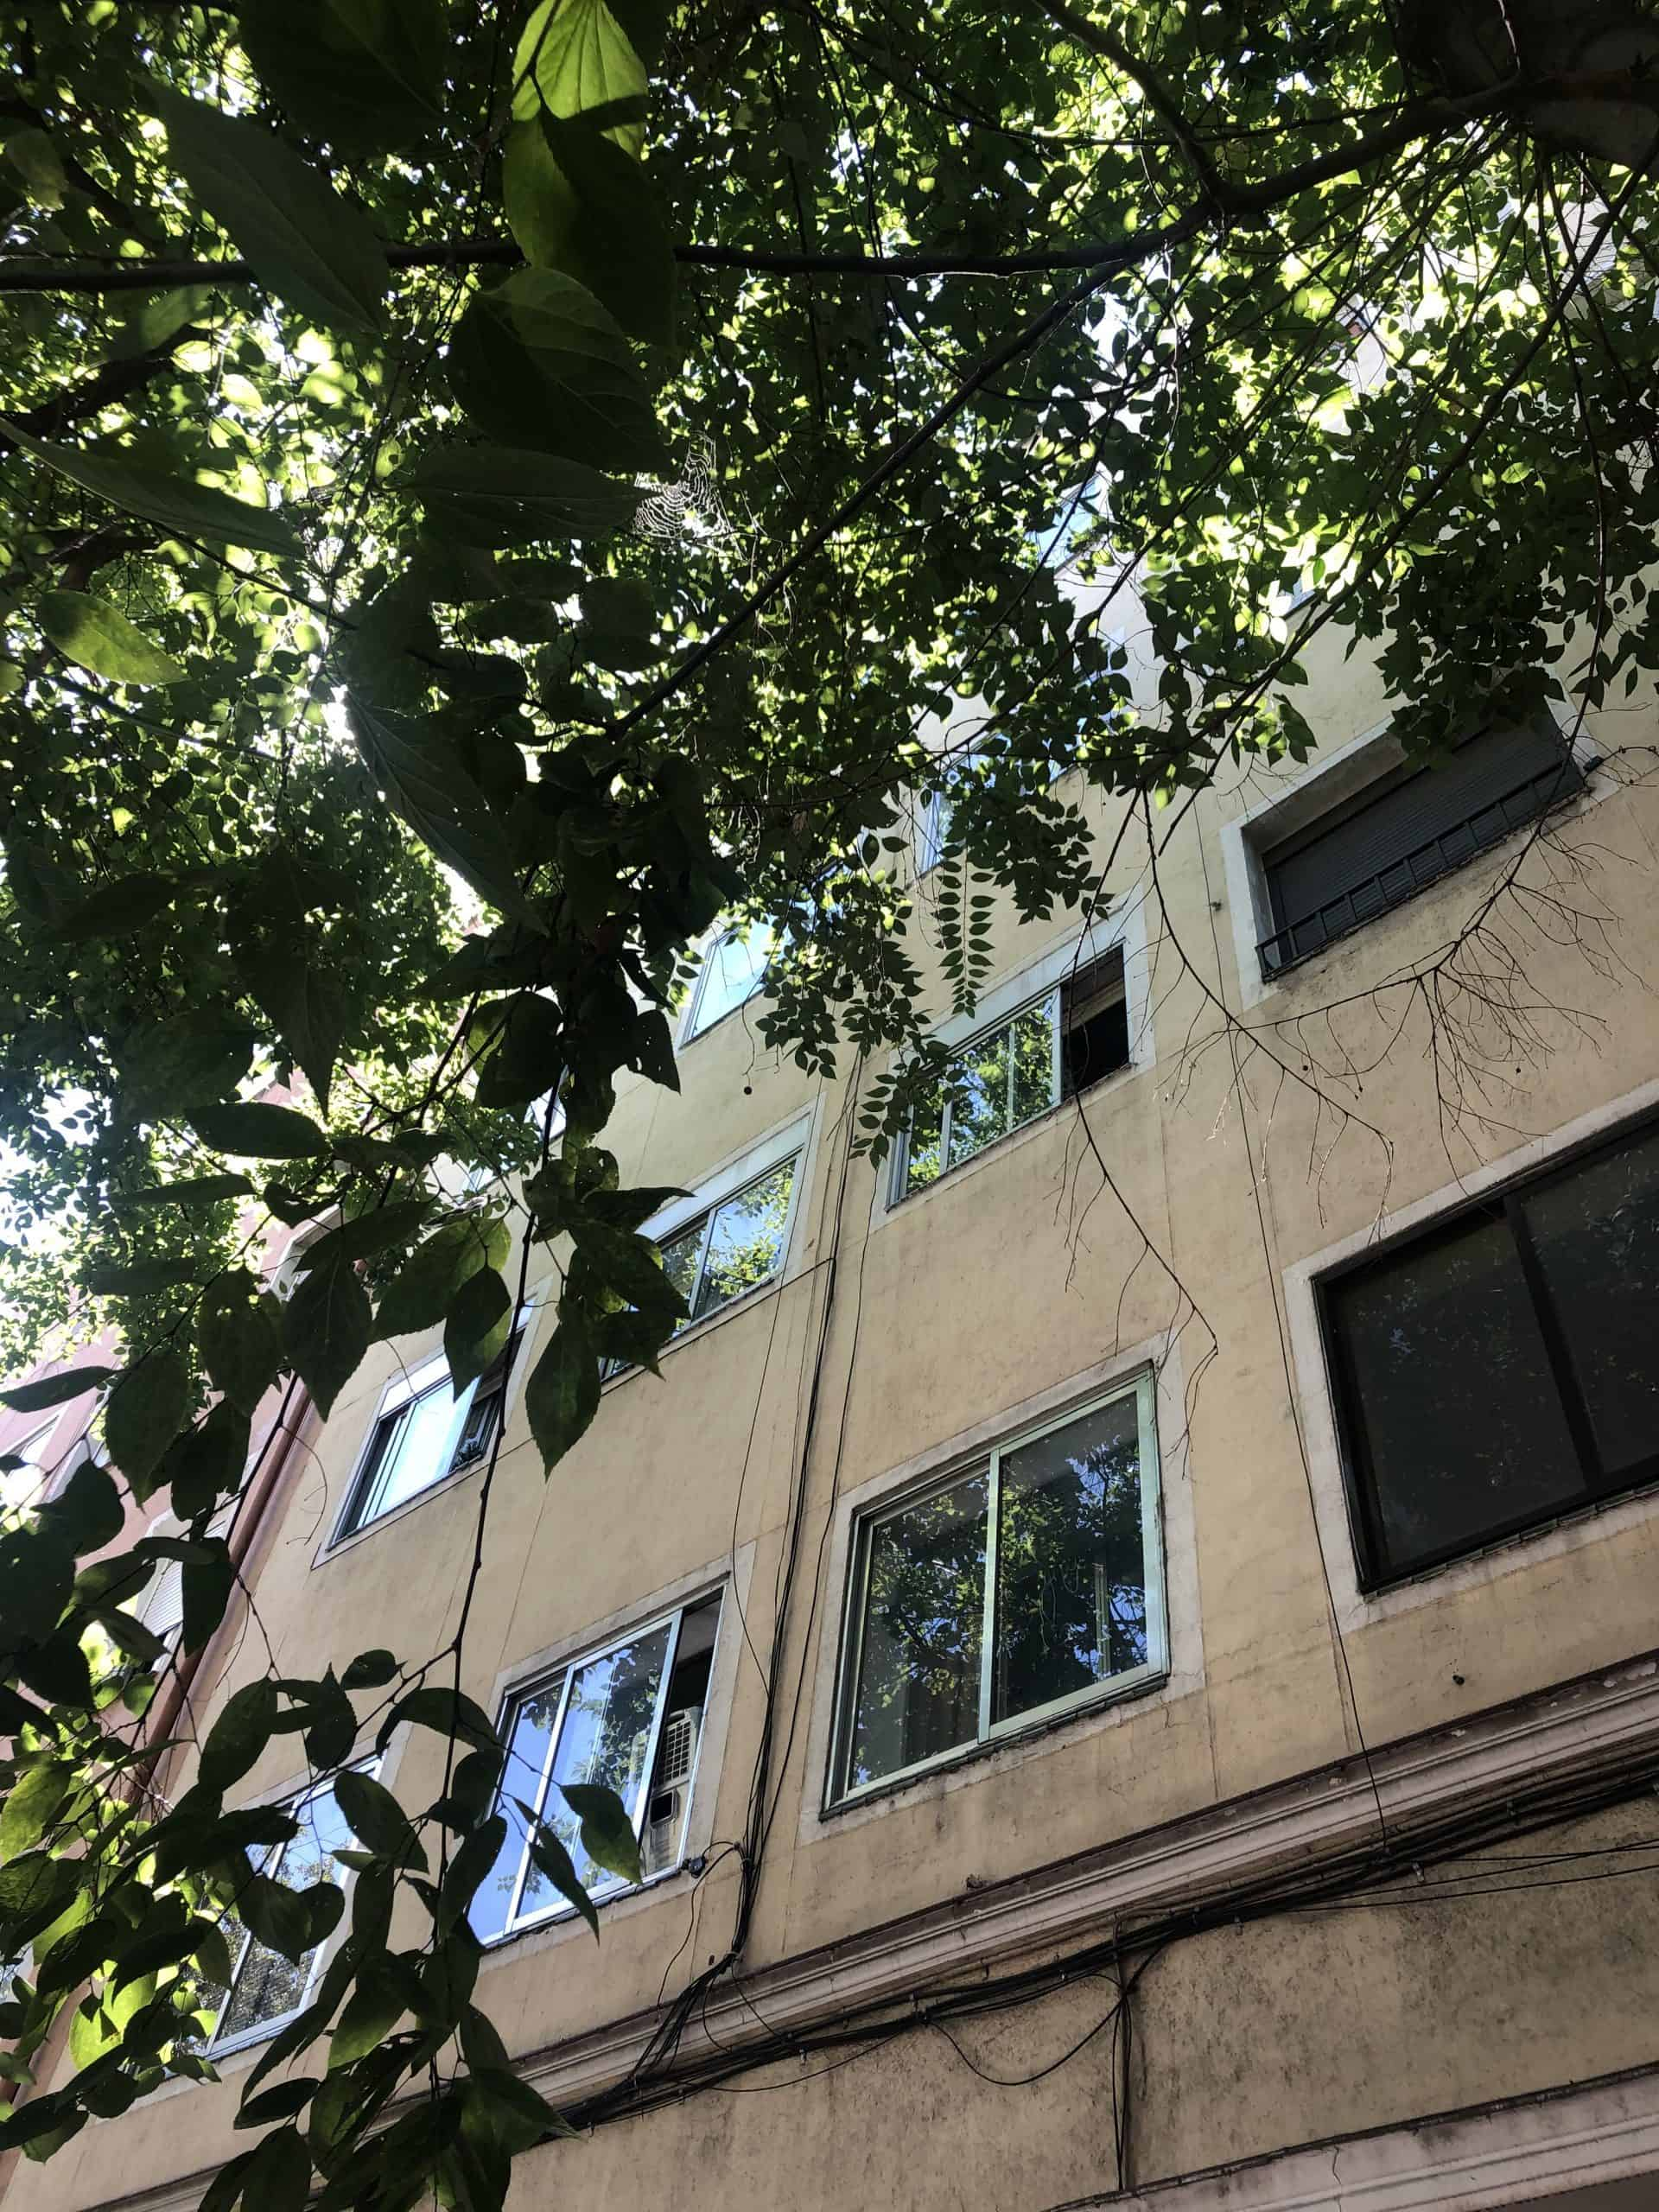 Agencia Inmobiliaria de Madrid-FUTUROCASA-Zona ARGANZUELA-EMBAJADORES-LEGAZPI -calle Embajadores- Fachada